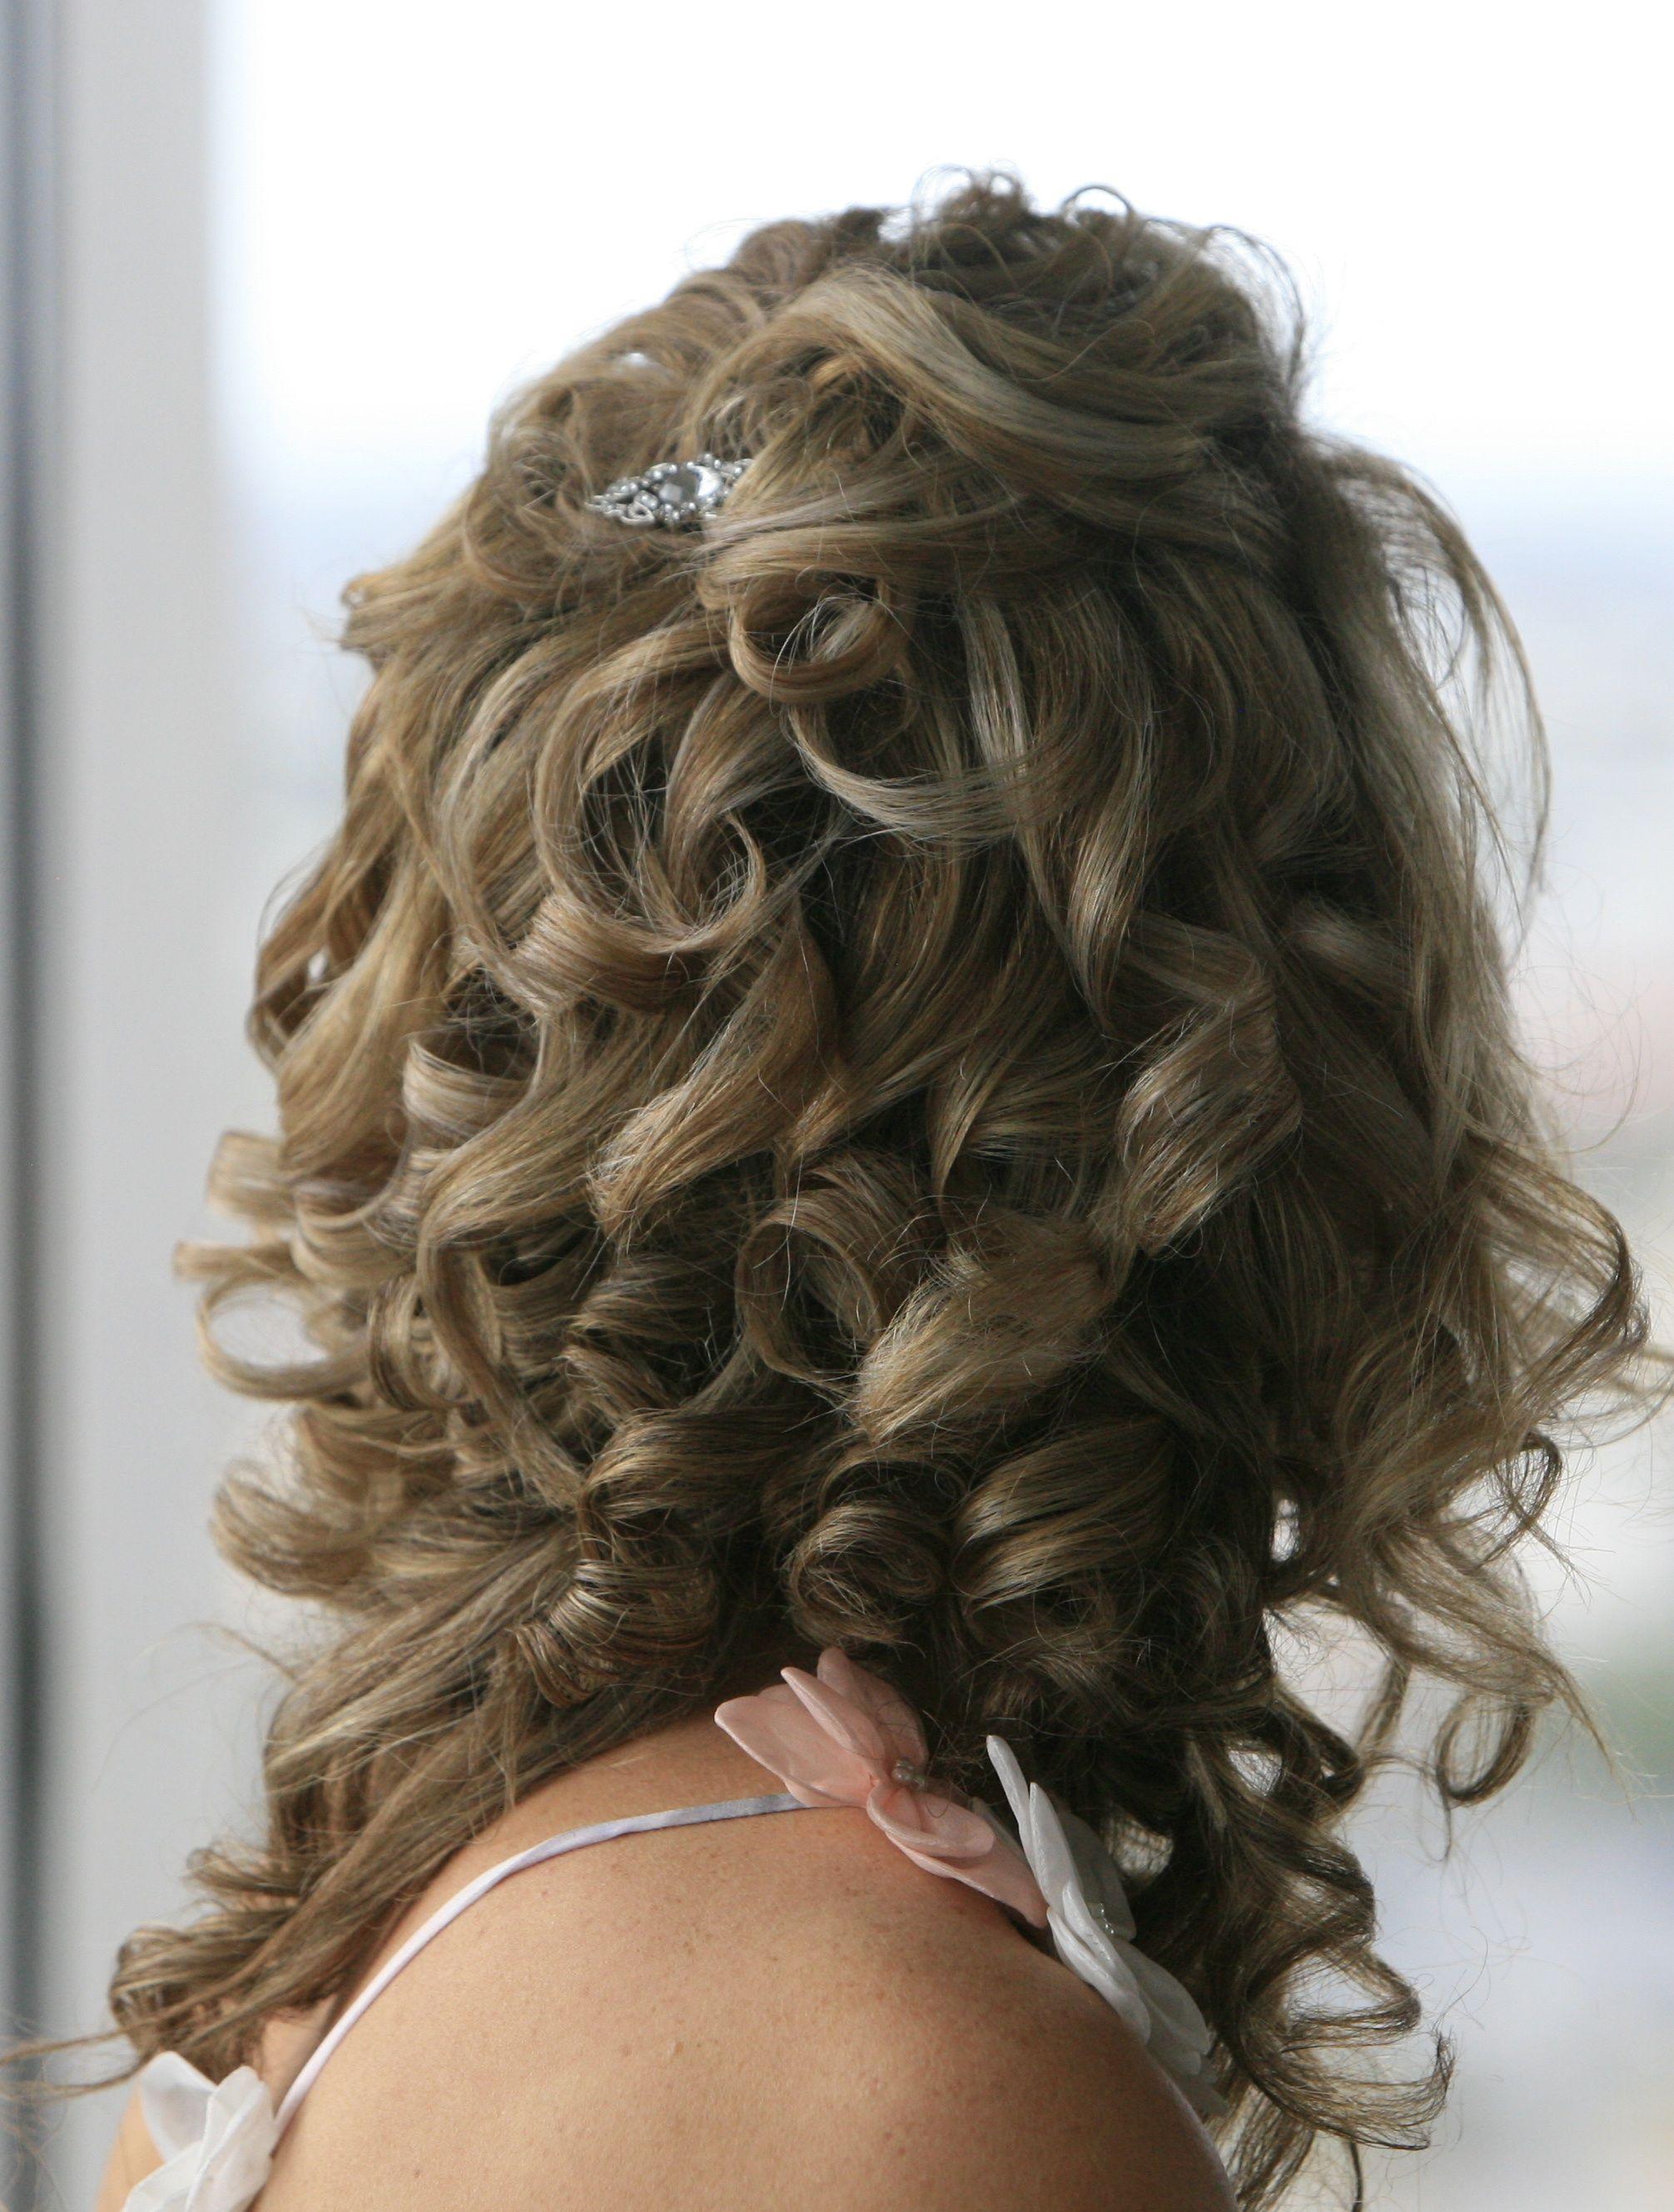 ringlet curls   Hair styles, Formal hairstyles, Ringlet curls